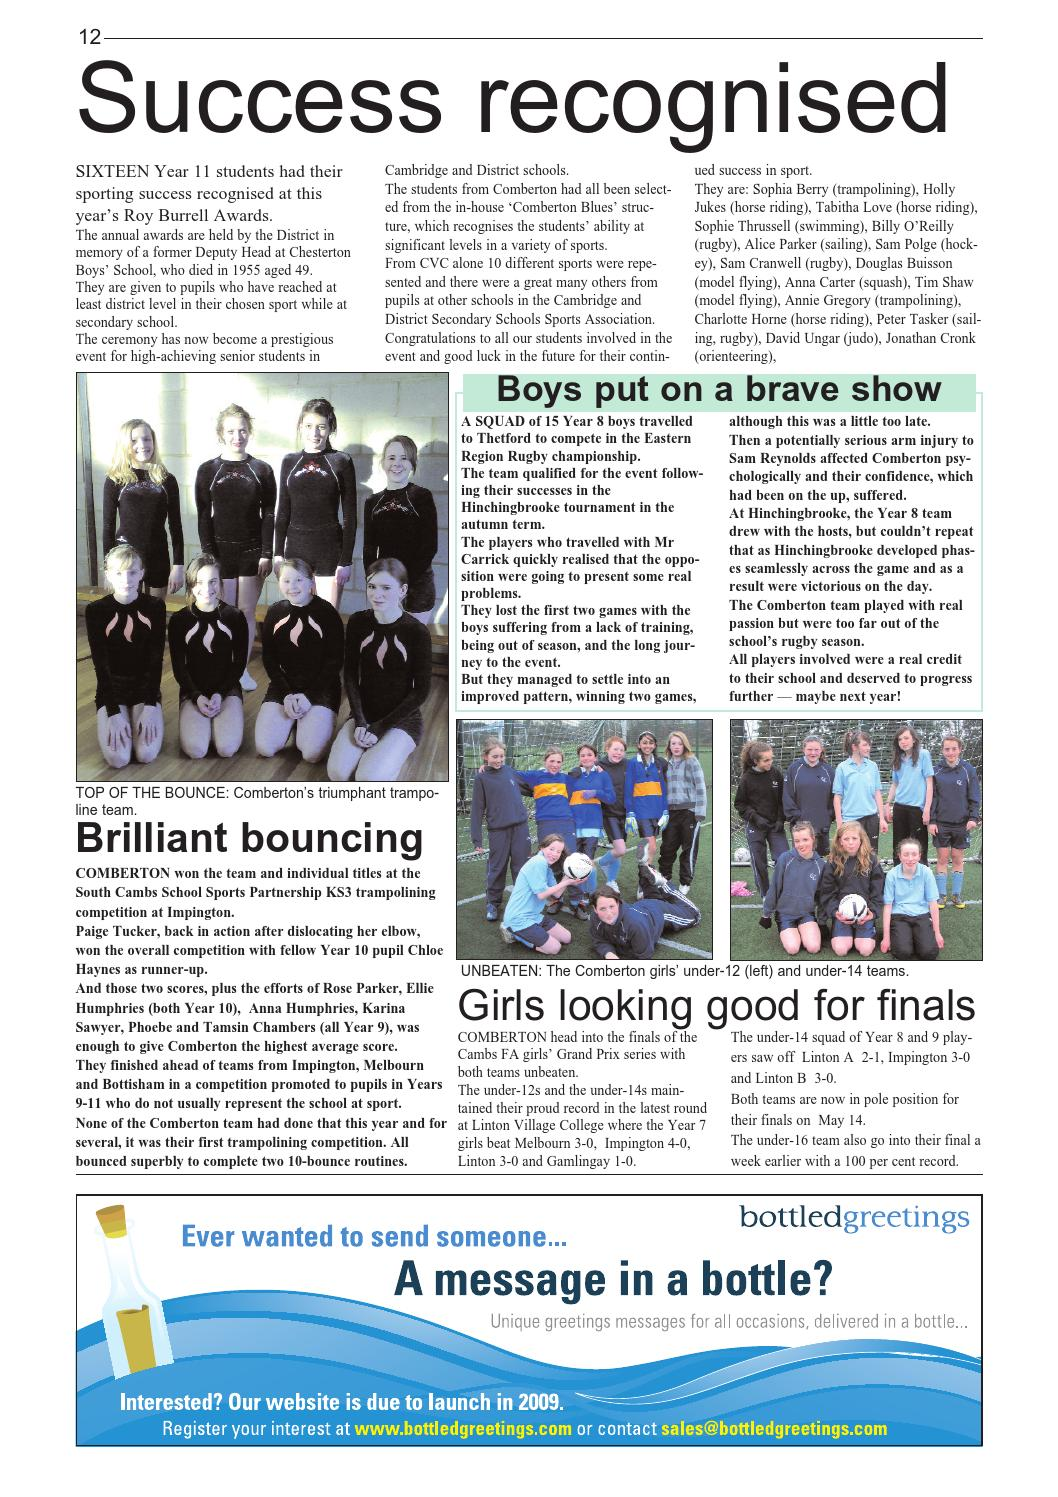 News@com spring 09 by The Cam Academy Trust - issuu